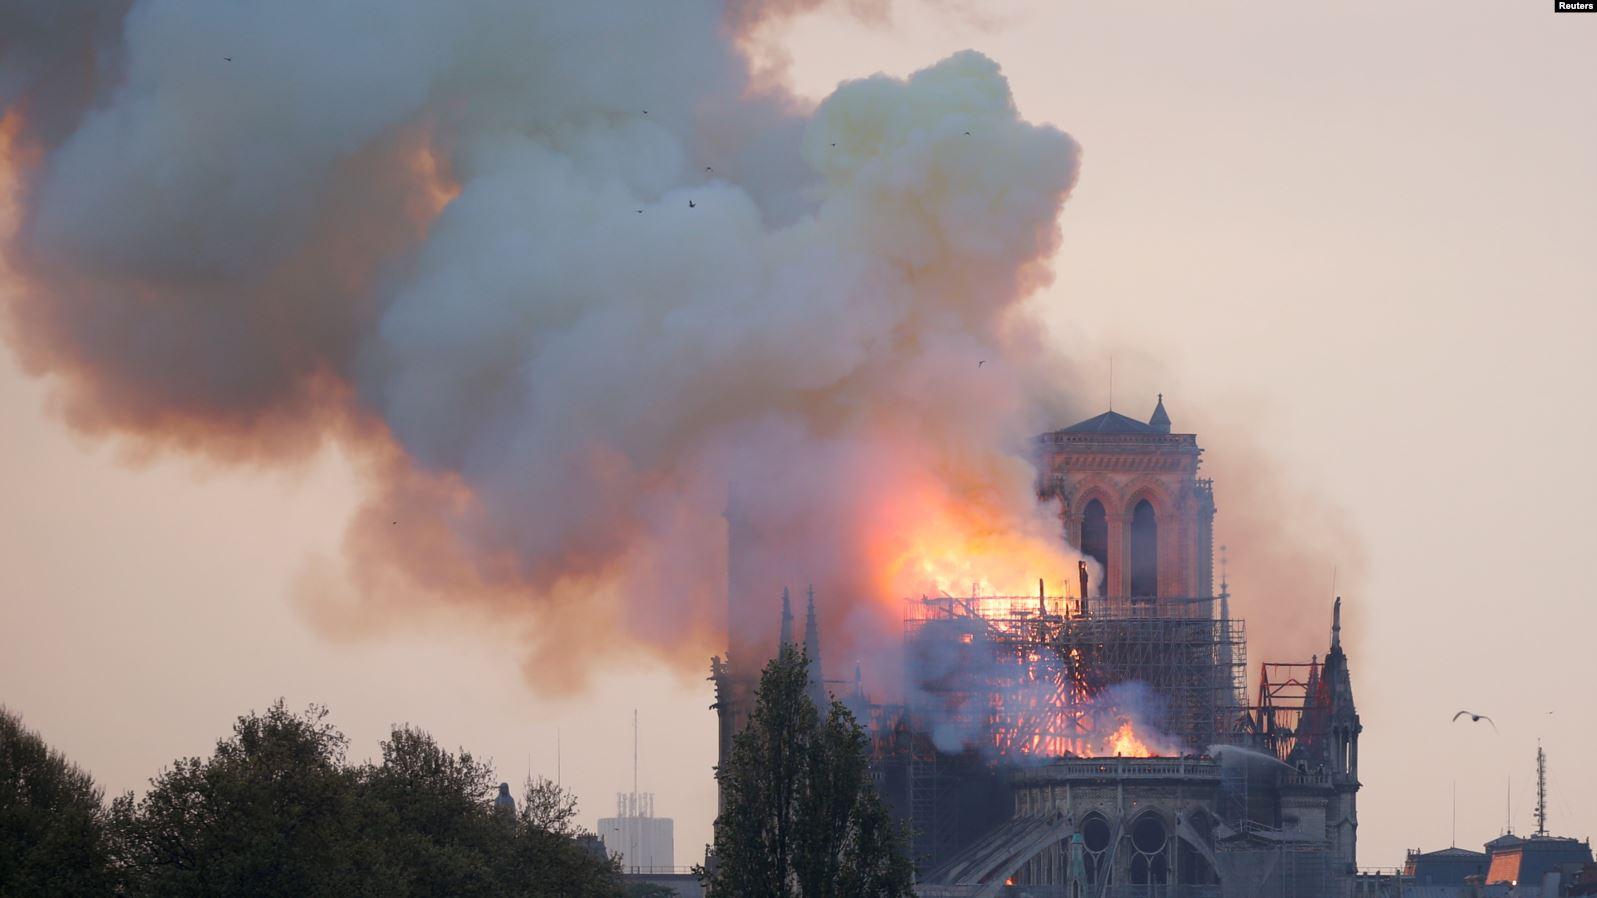 У соборі Паризької Богоматері сталася пожежа